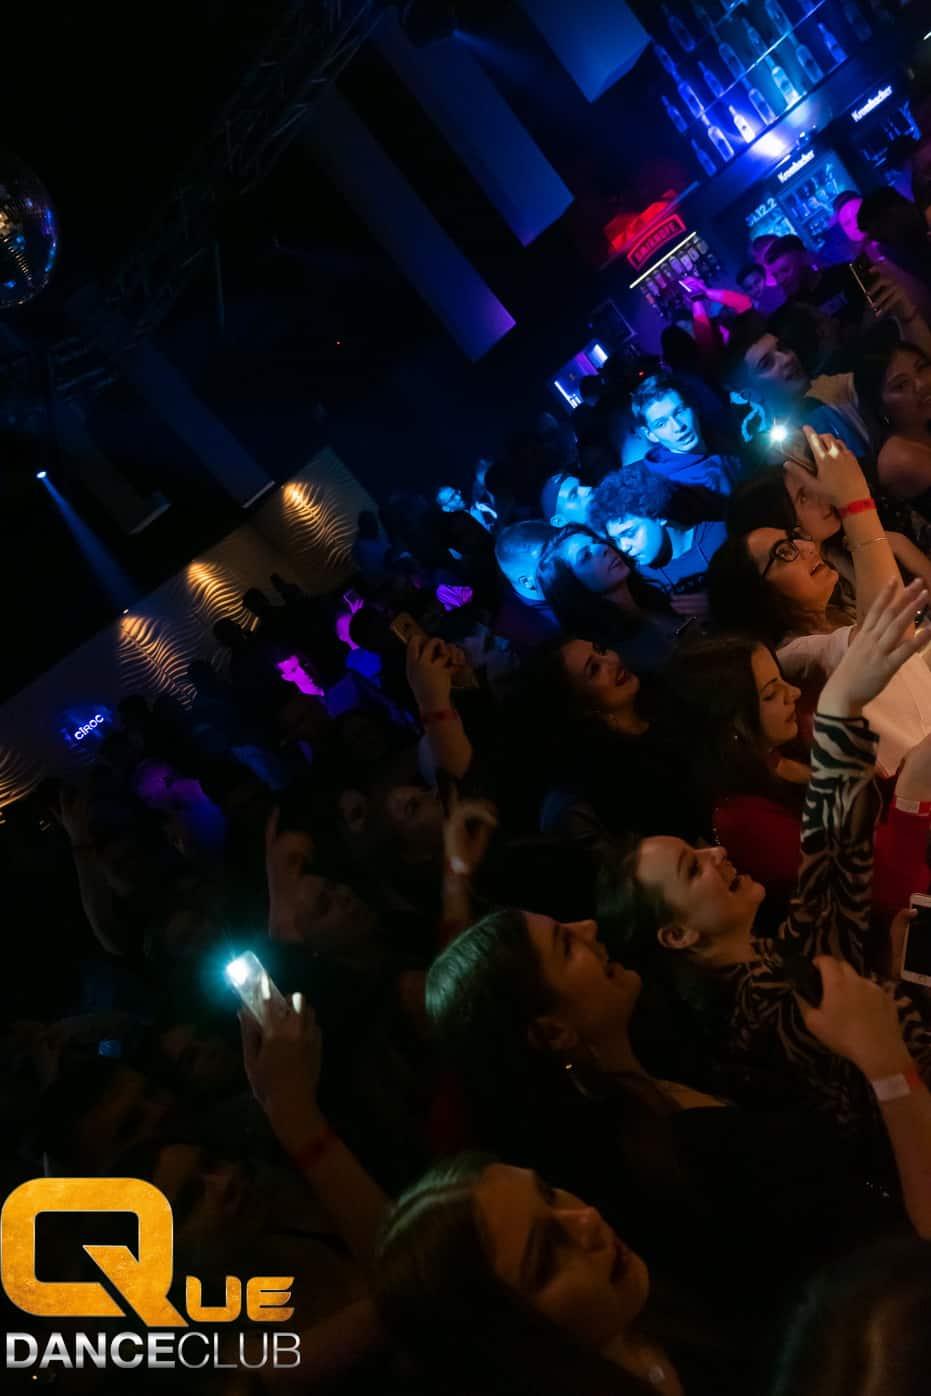 2018_12_08_Que_Danceclub_Paparazzo_Night_Ardian_Bujupi_Live_Nightlife_Scene_Timo_059